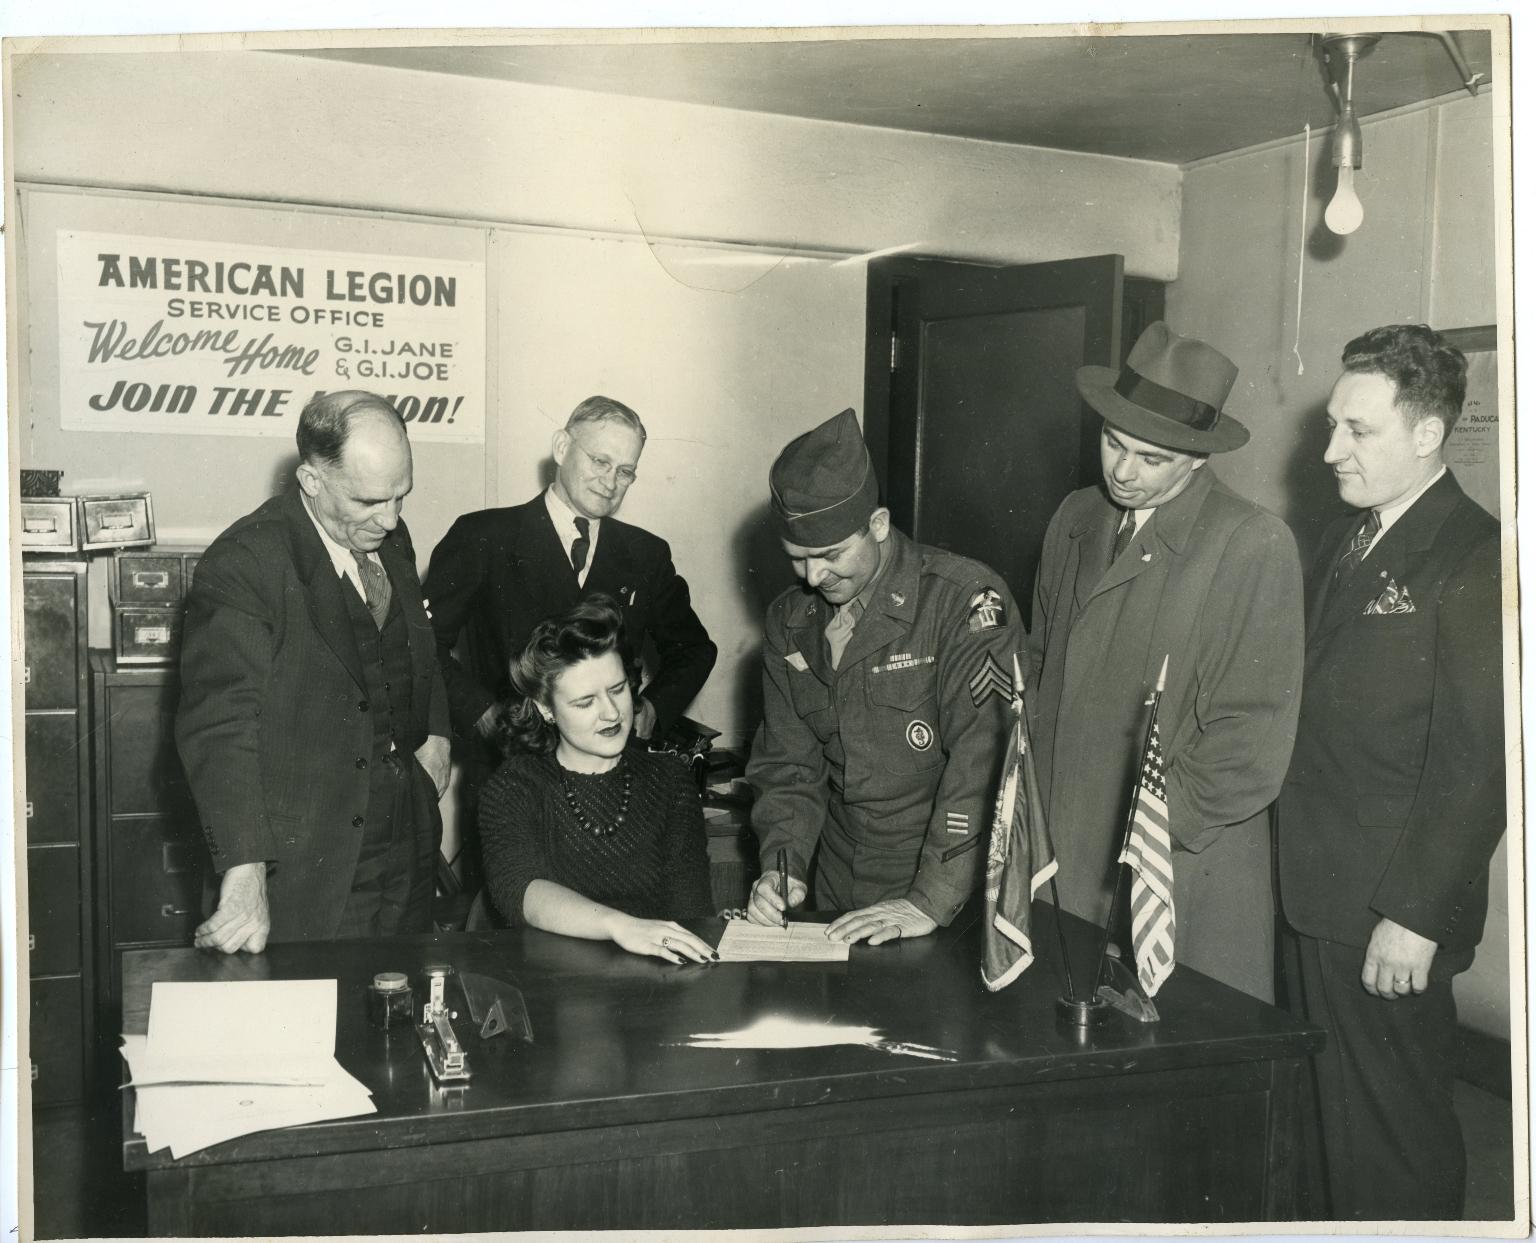 American Legion Service Office